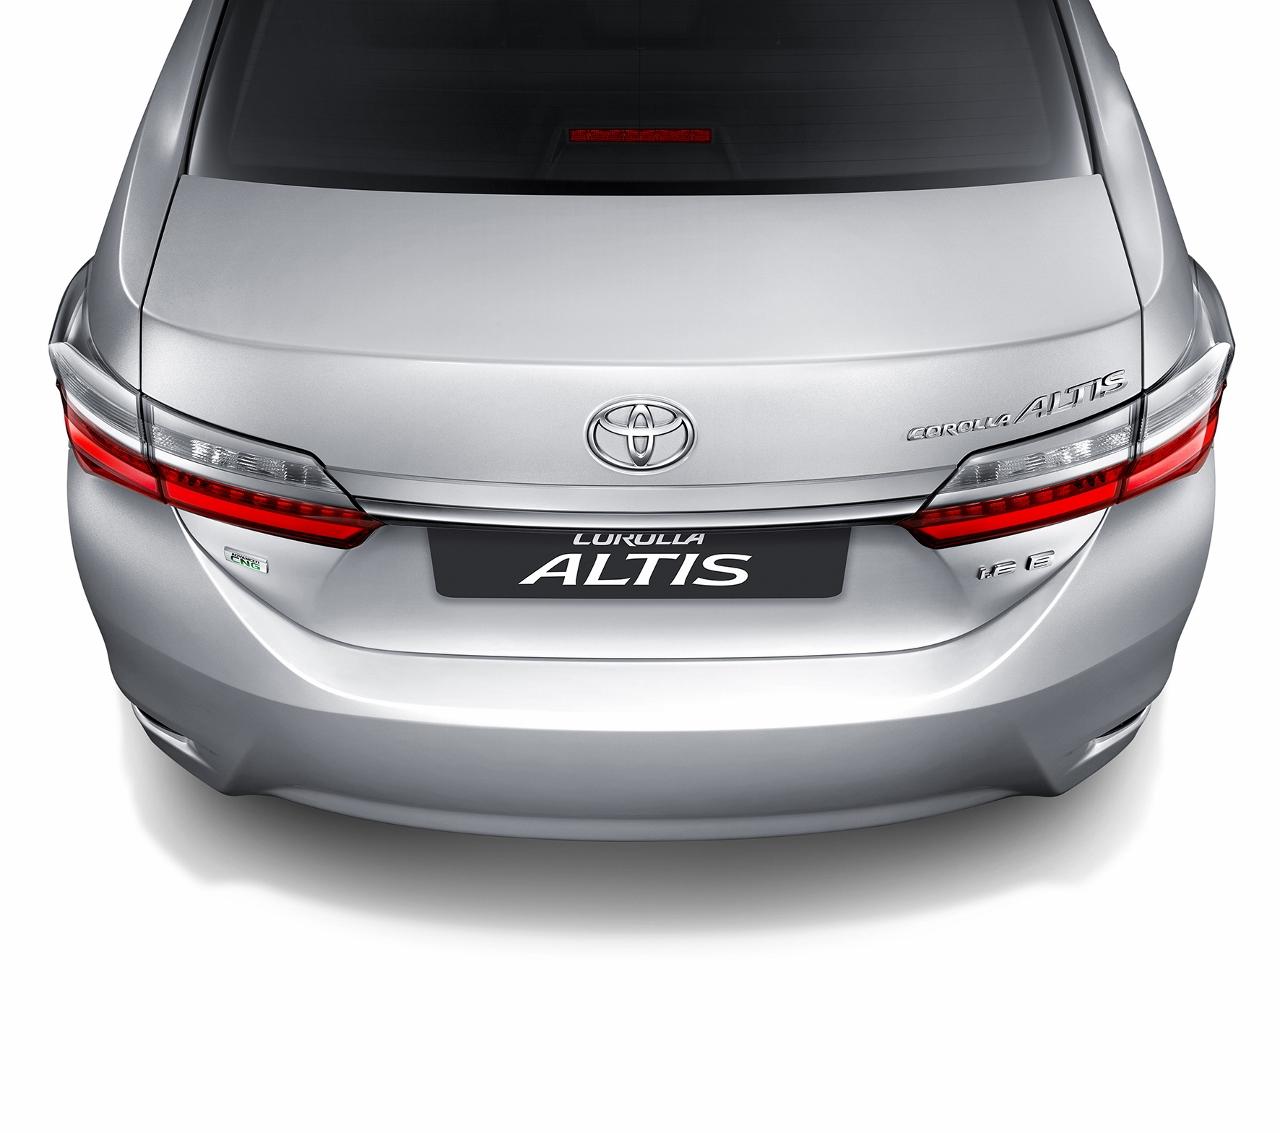 2017 Toyota Corolla Altis rear end Thailand